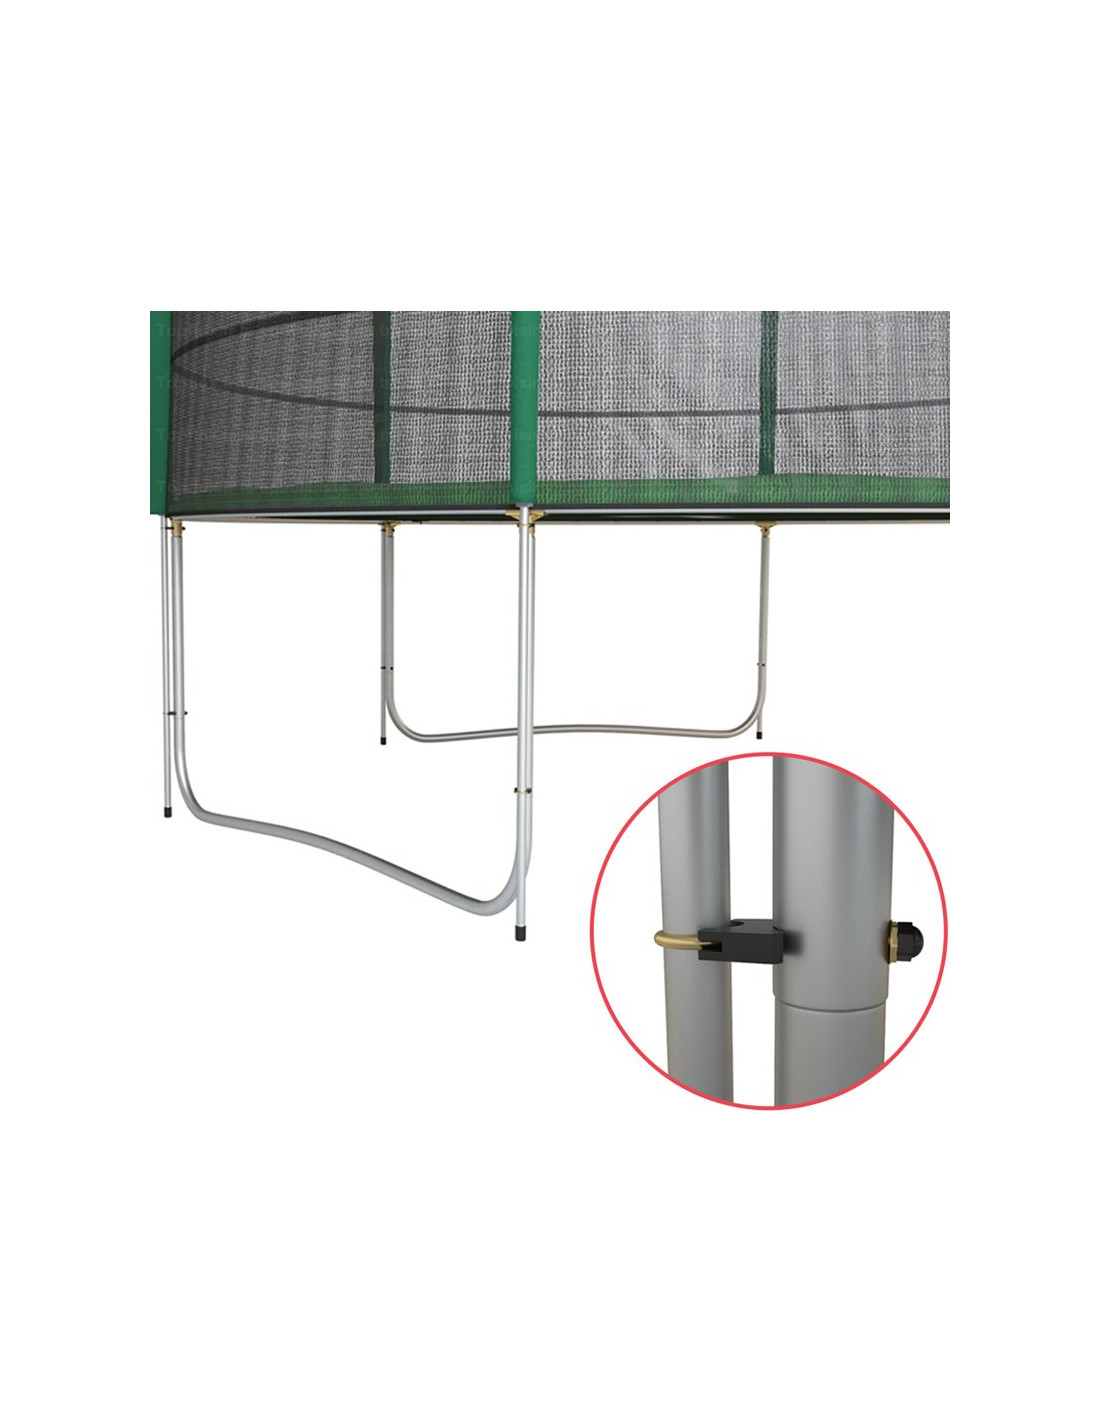 trampoline 430 cm pas cher trampoline de bonne qualit. Black Bedroom Furniture Sets. Home Design Ideas